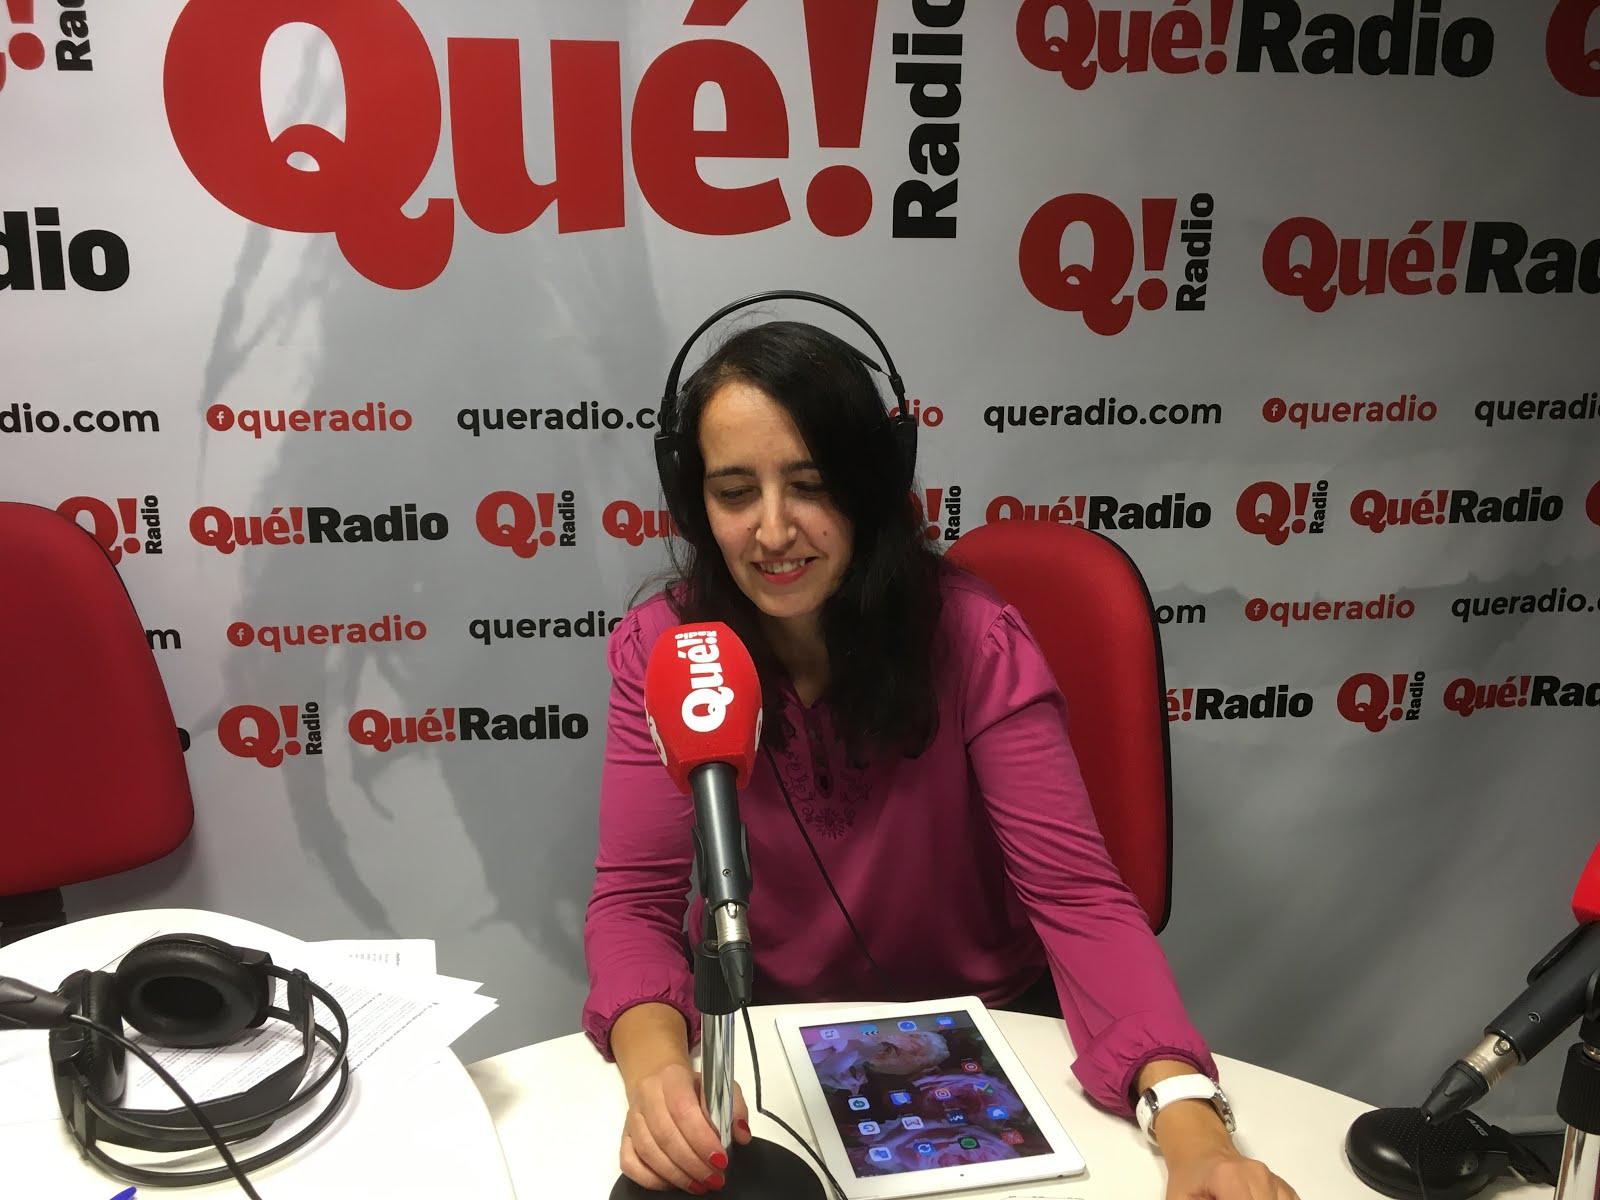 TERTULIANA EN EMISORAS DE RADIO